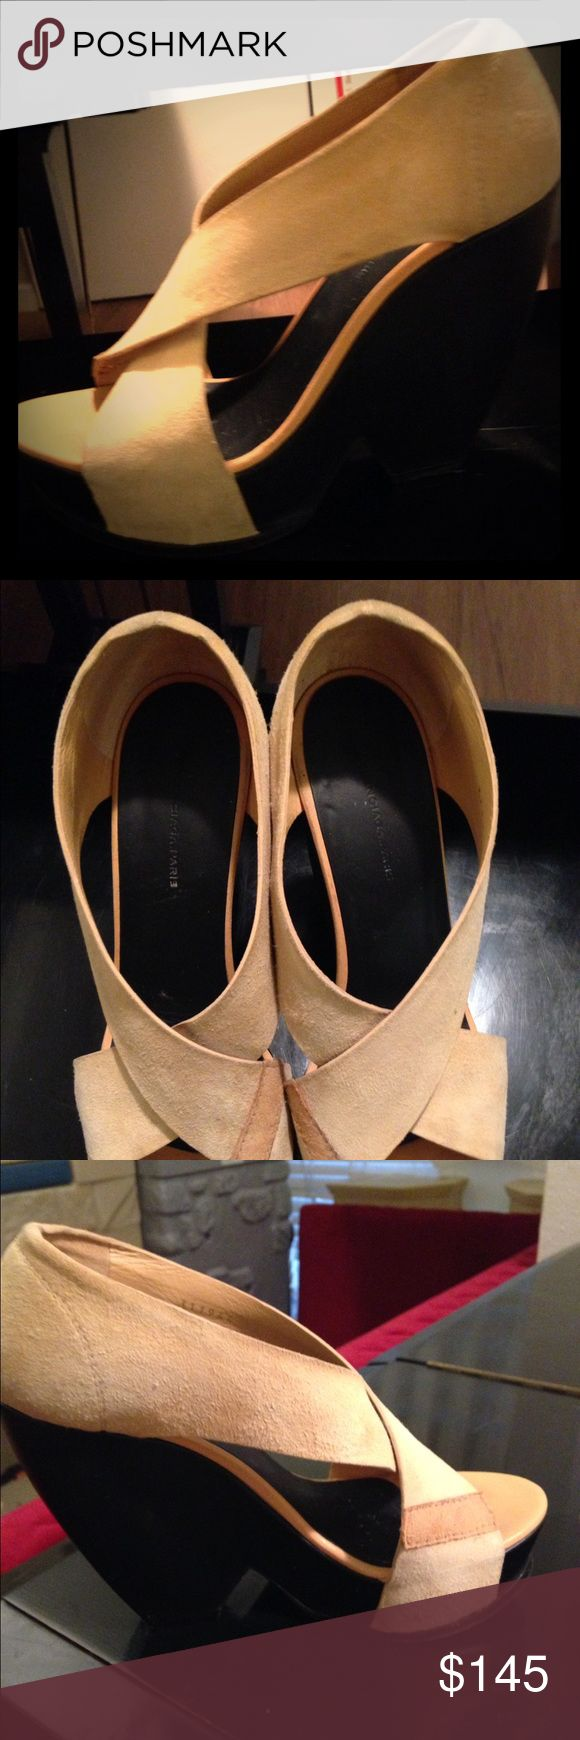 Balenciaga shoes. Gently used.2 hours sale! Balenciaga Shoes Platforms